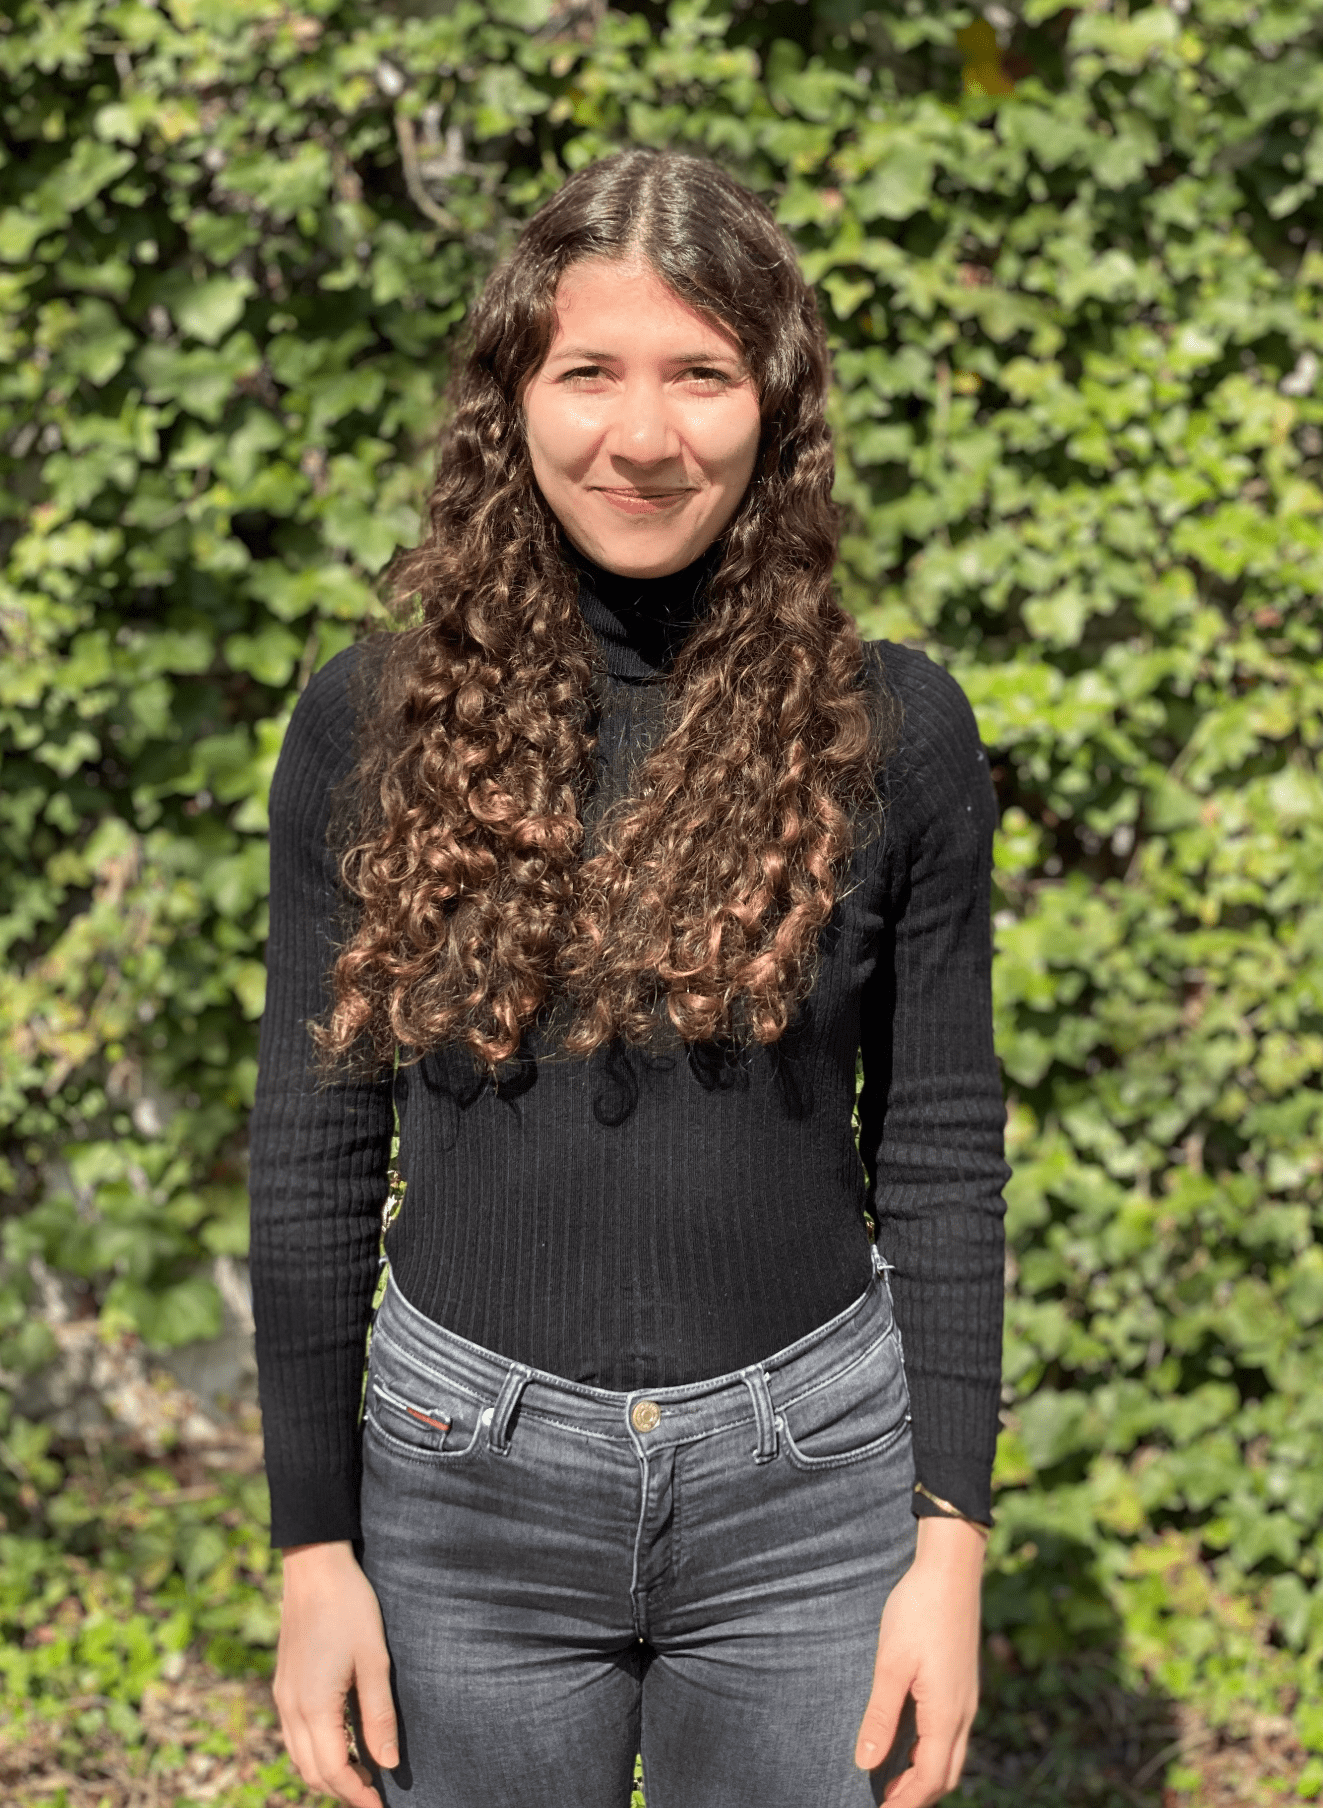 Lara Siebert